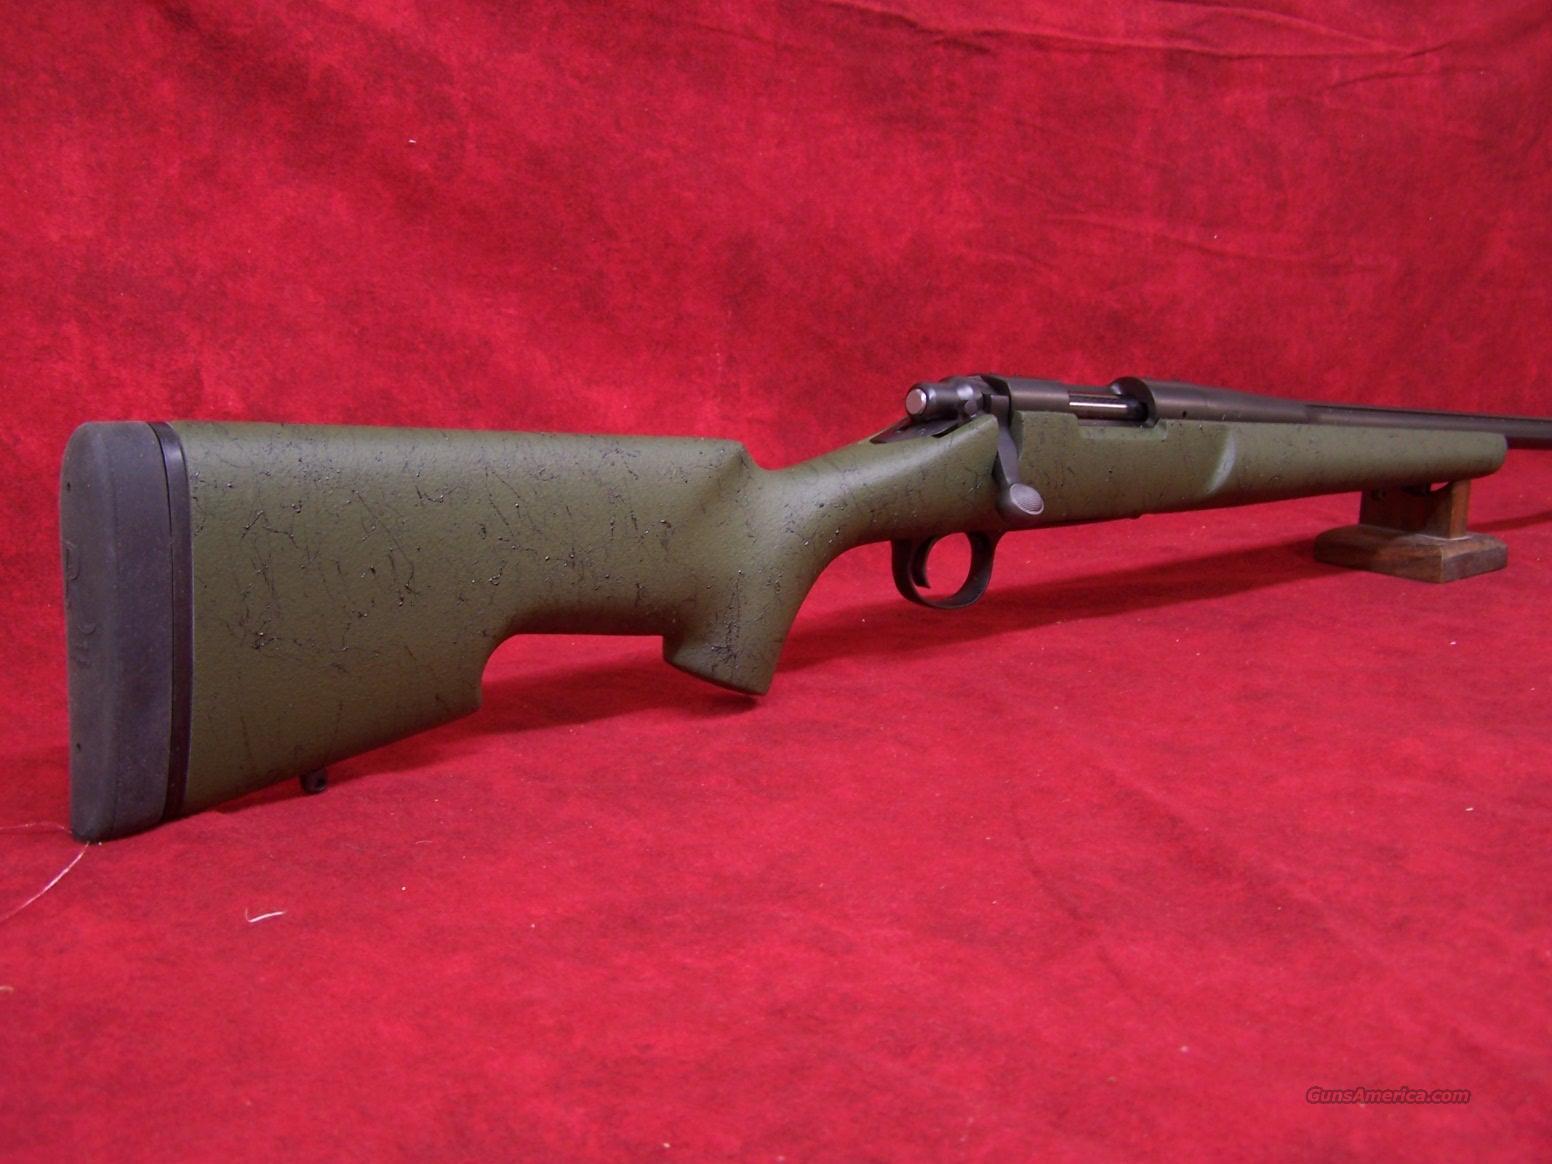 "Remington 700 XCR Tactical Long Range .300 Win Mag 26""(84462)  Guns > Rifles > Remington Rifles - Modern > Model 700 > Tactical"